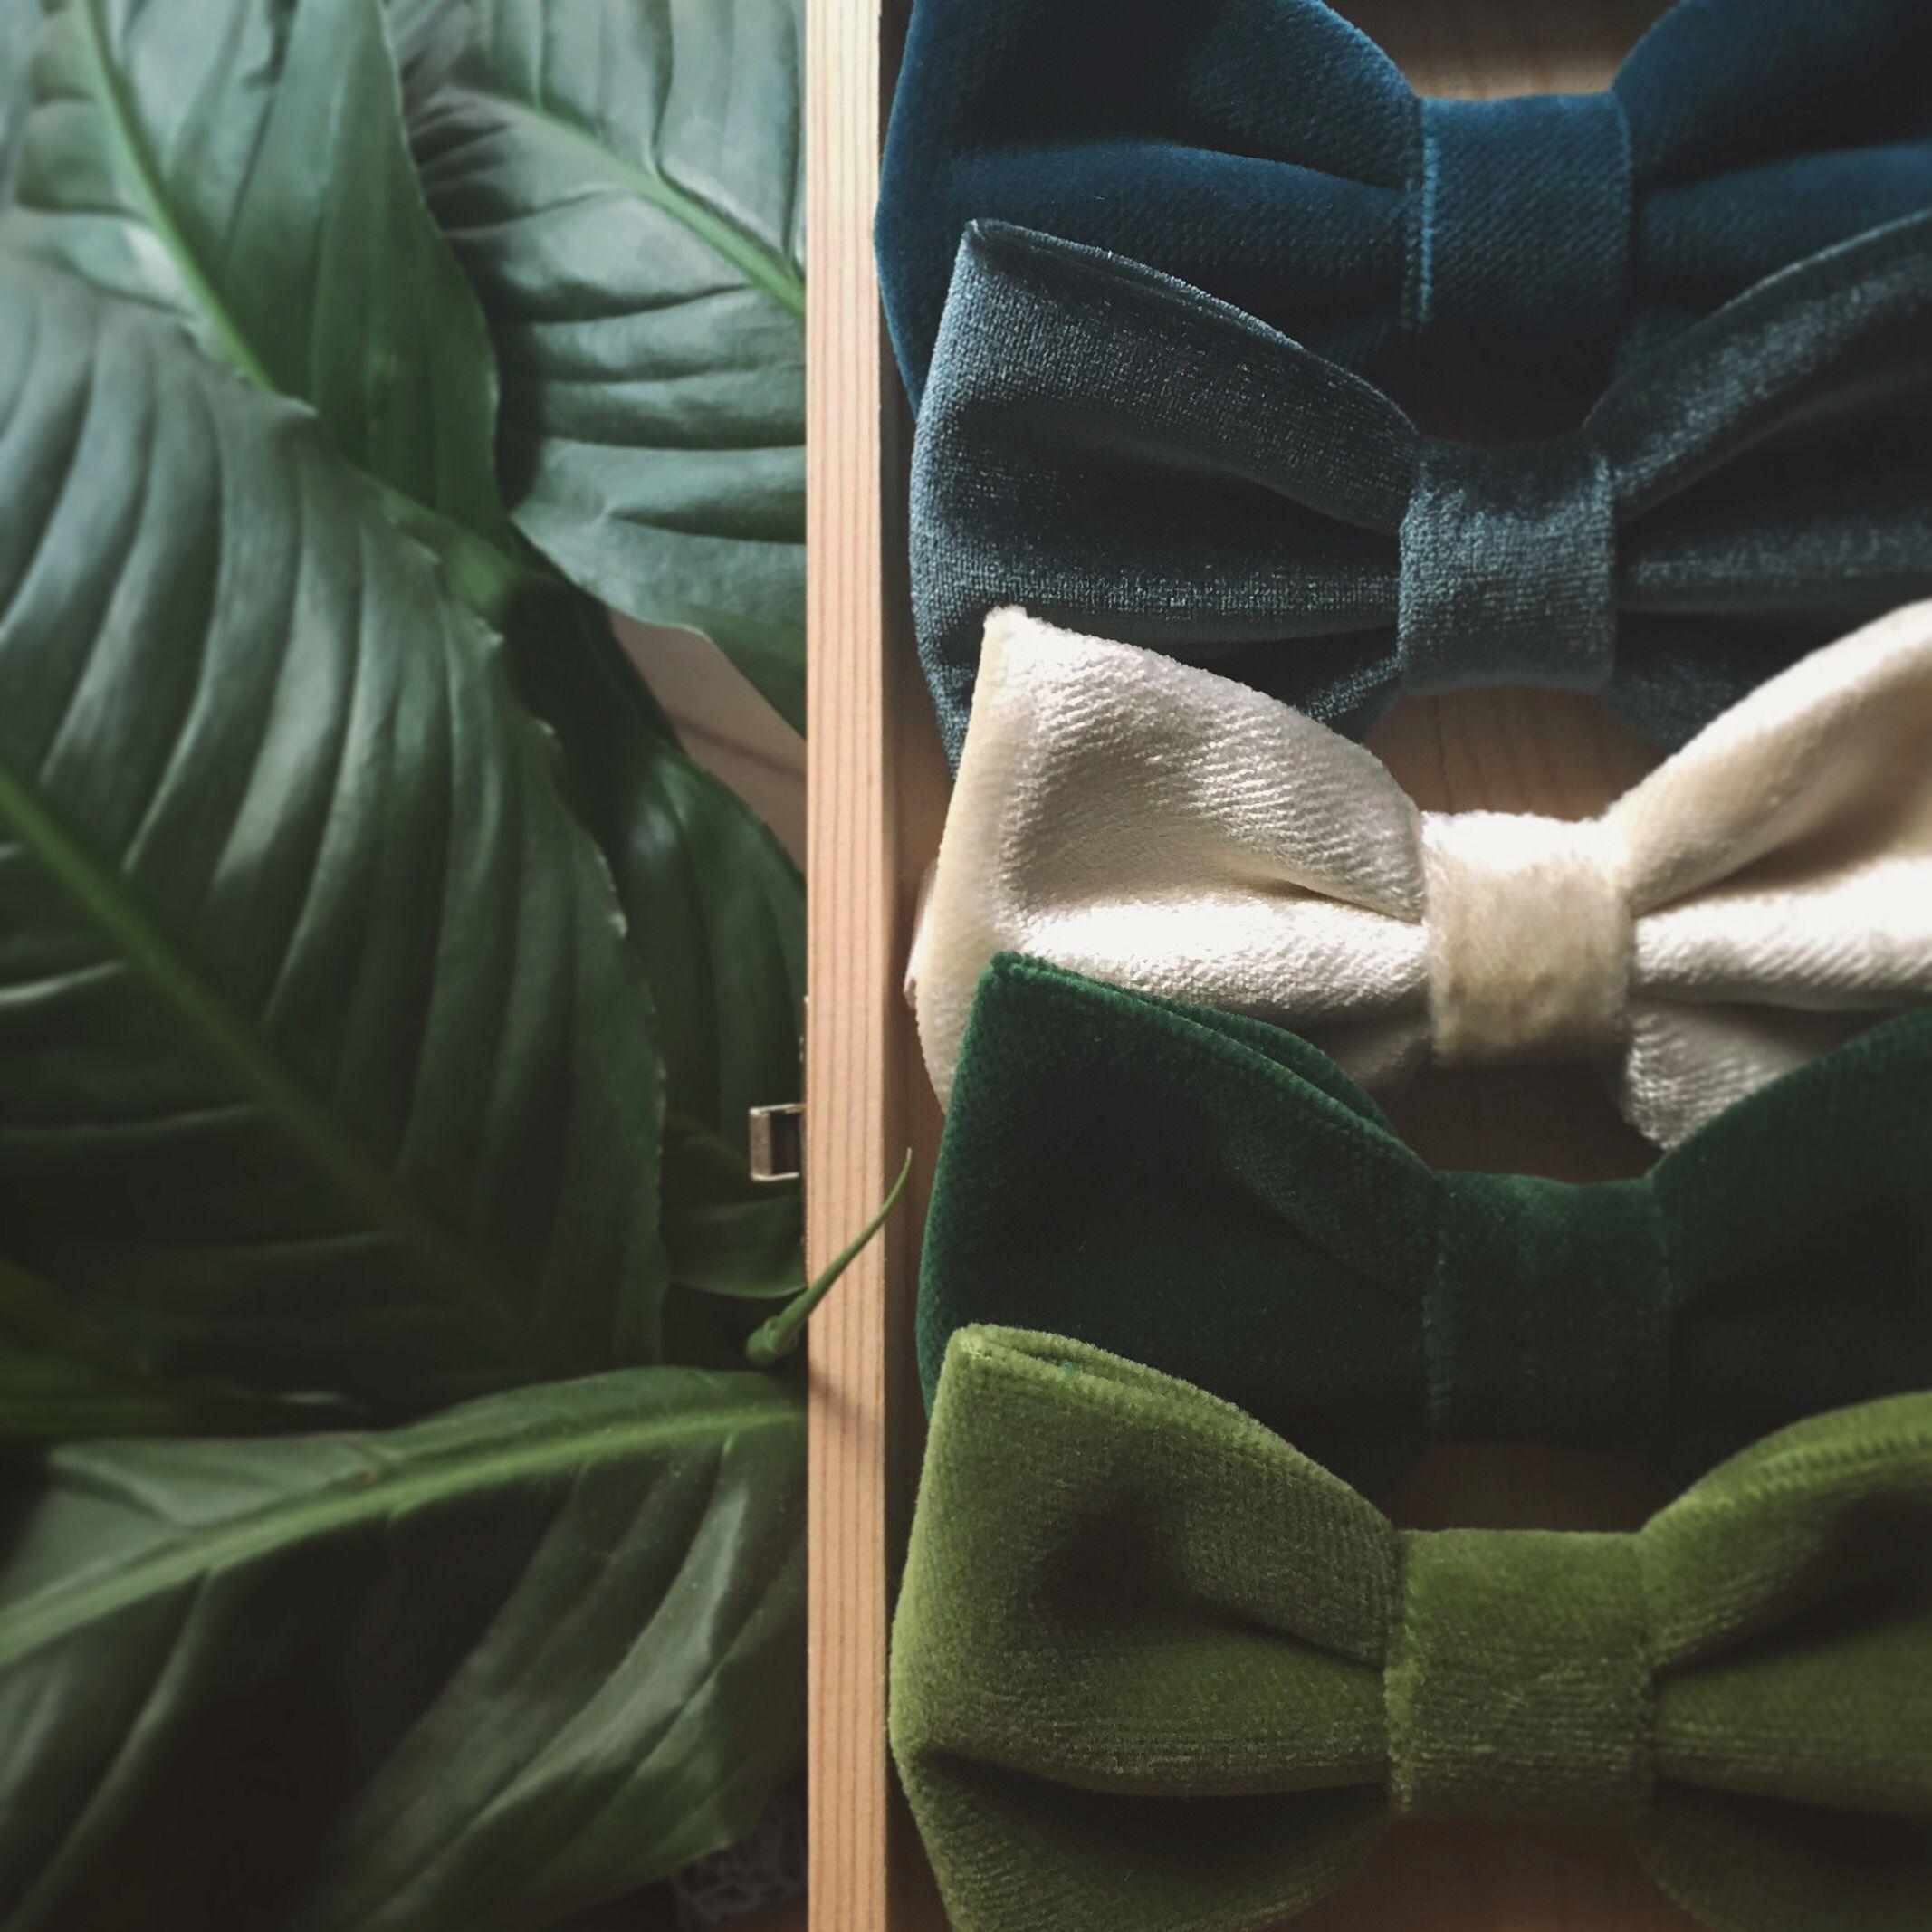 Velvet Bow ties, greenery inspiration. @scoccapapillon Winter Collection 2019. #greenery #botanical #velvet #velvetbowtie #bowtie #groom  #groomsmen #fallwedding #green #winterwedding #wedding #tie #botanicinspiration #botanicalwedding #vintagewedding #bohowedding #bohemianwedding #tropicalwedding #organicwedding #ceremony #rusticwedding #greenerywedding #teal #olive #forest #etsy #etsyseller #etsyinspiration #men #mensfashion #gq #mensstyle